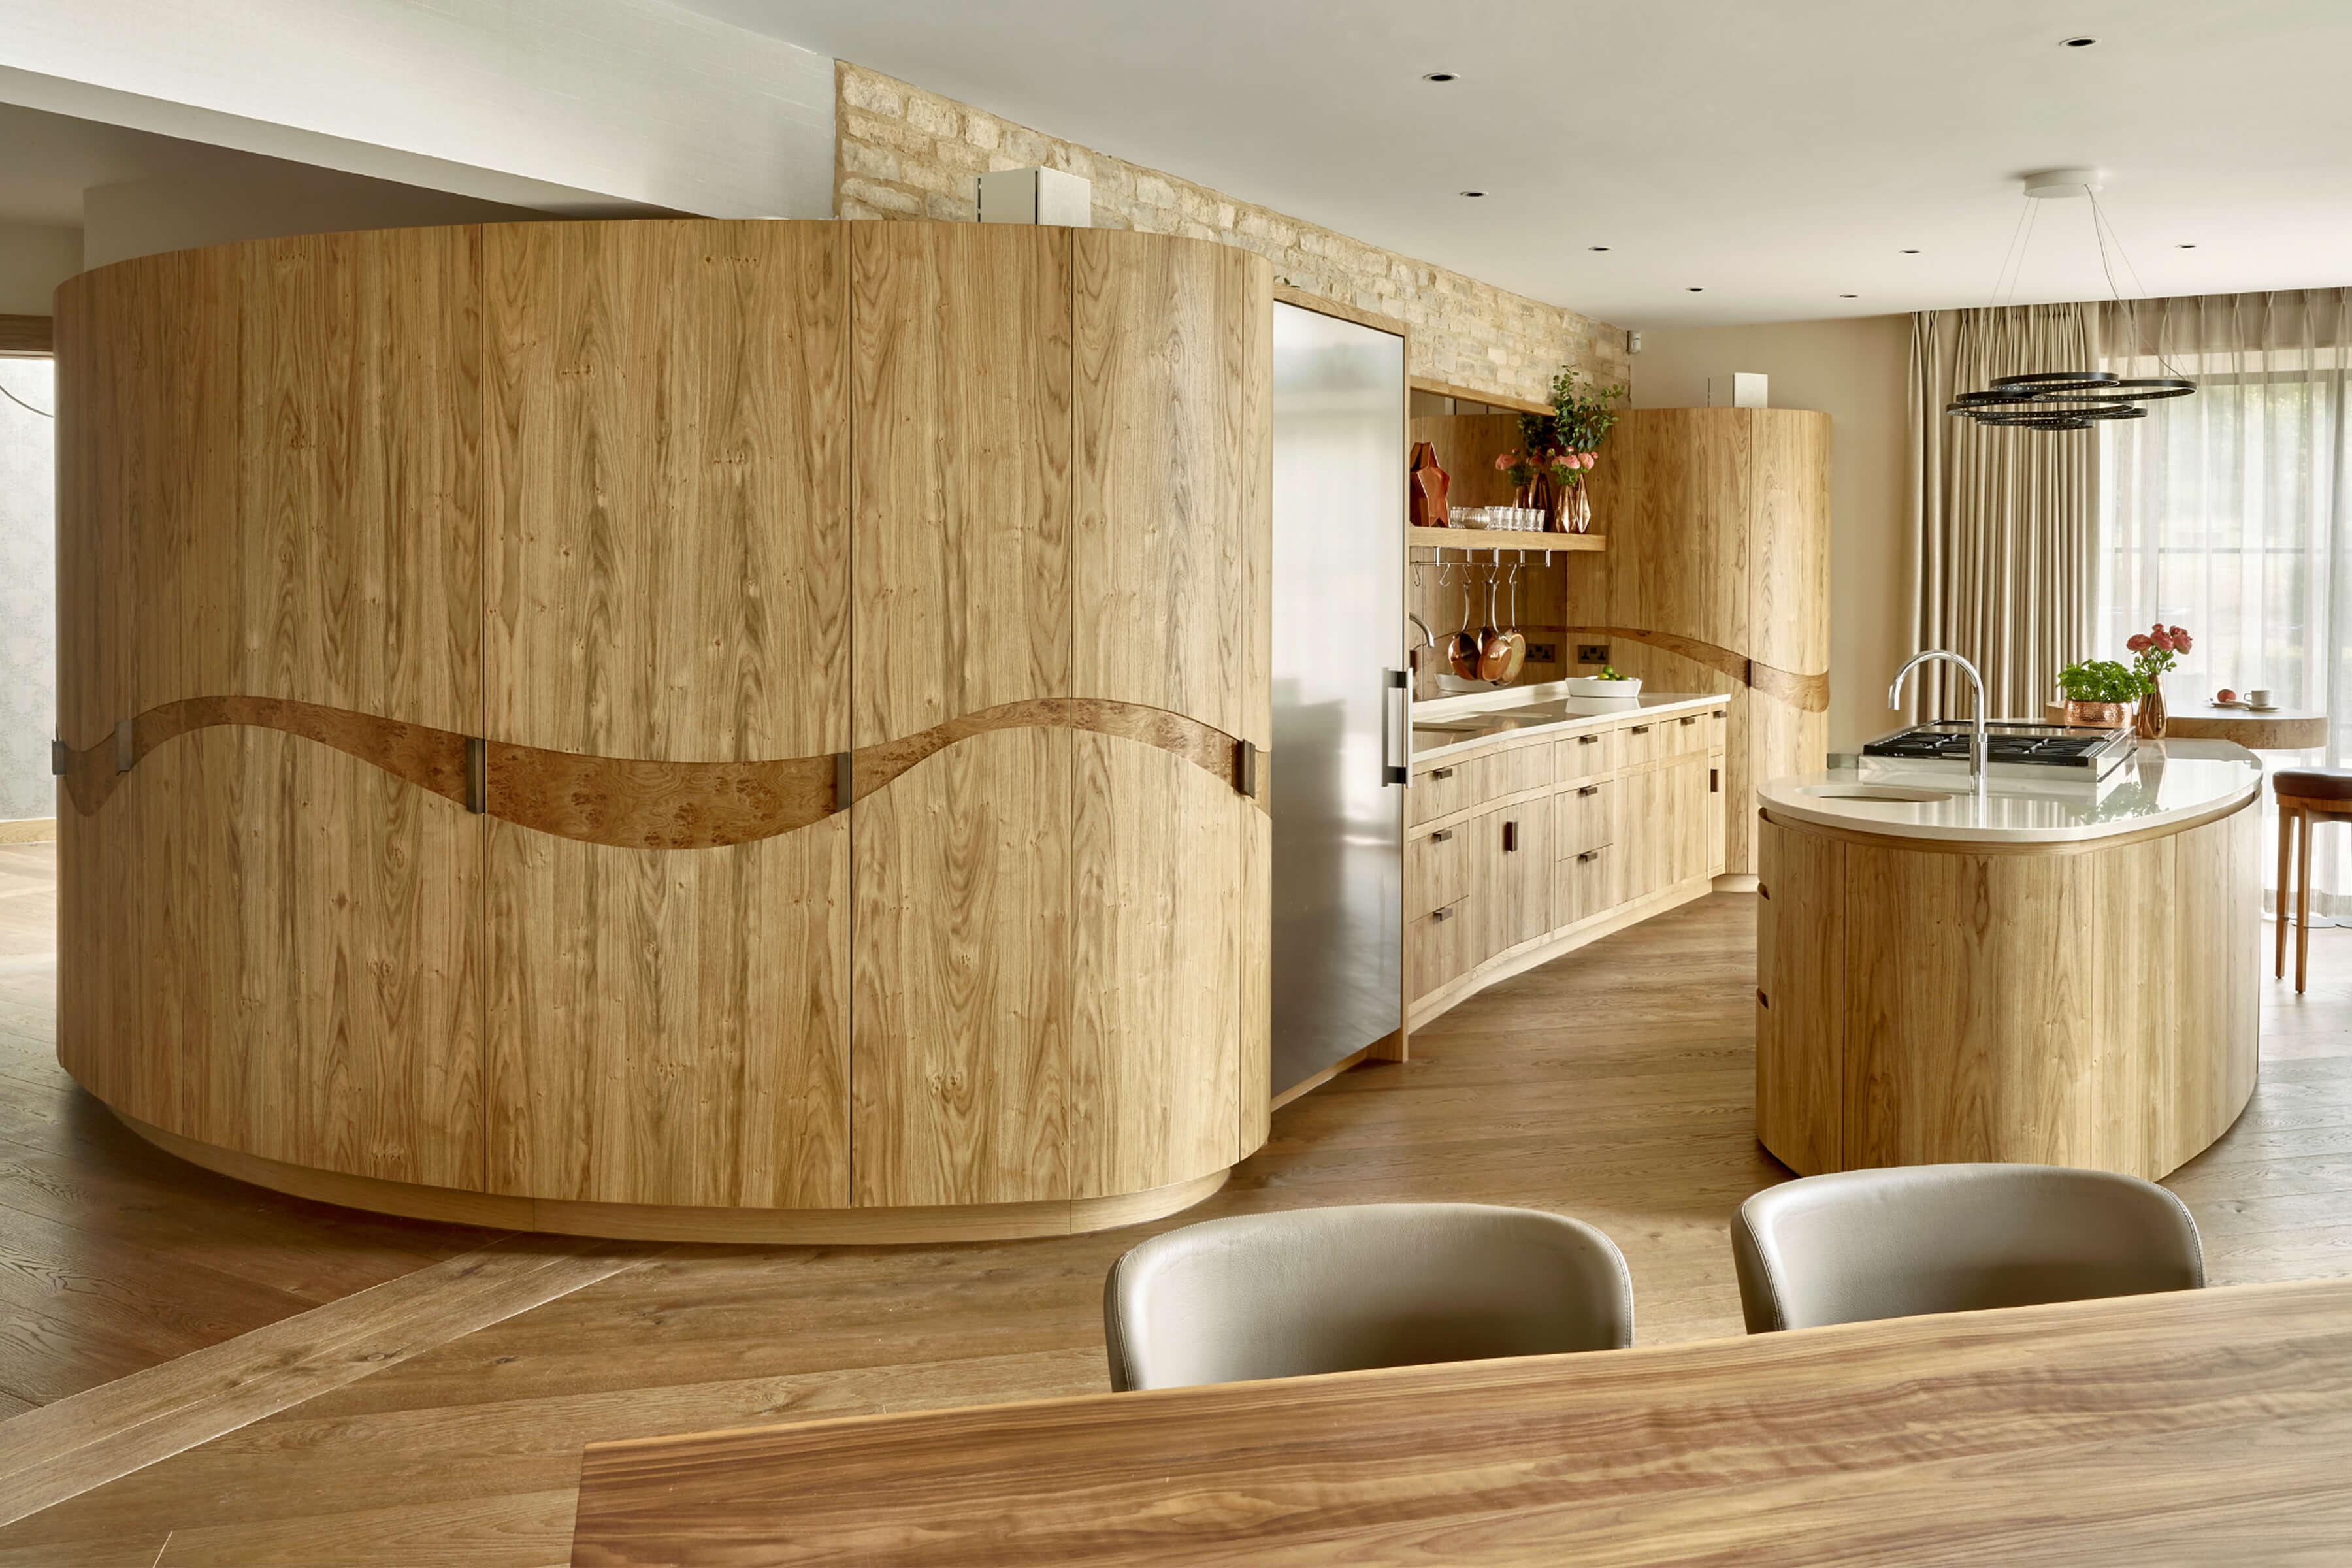 contemporary oak kitchen with organic shaped kitchen island